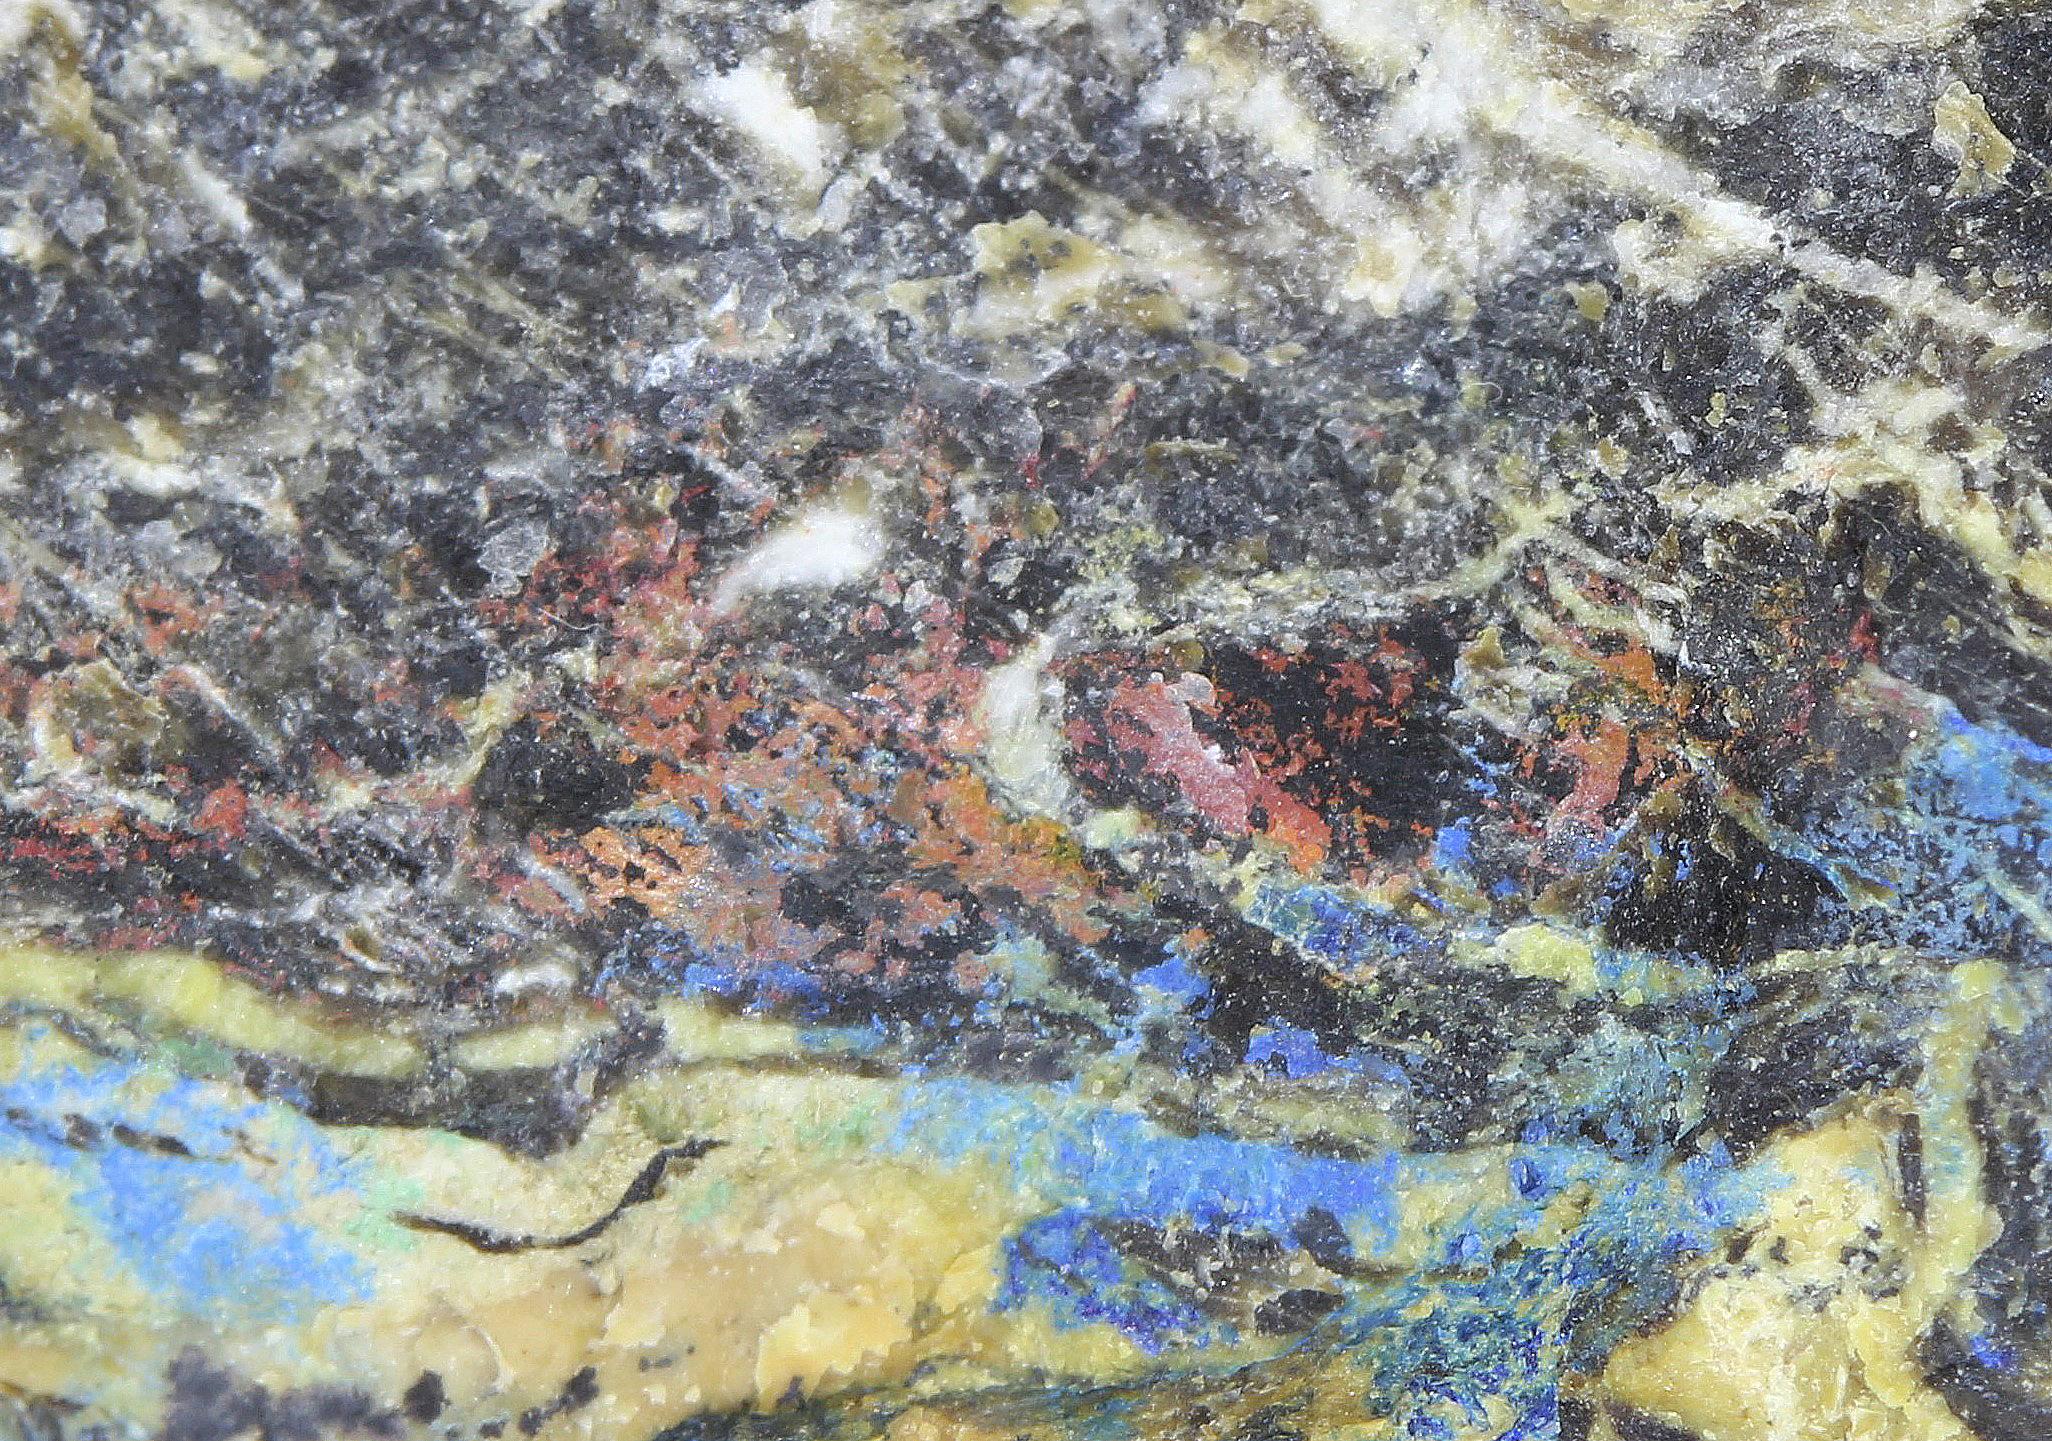 Cuprite, azurite, franklinite and calcite from the Sterling Hill Mine, Ogdensburg, NJ